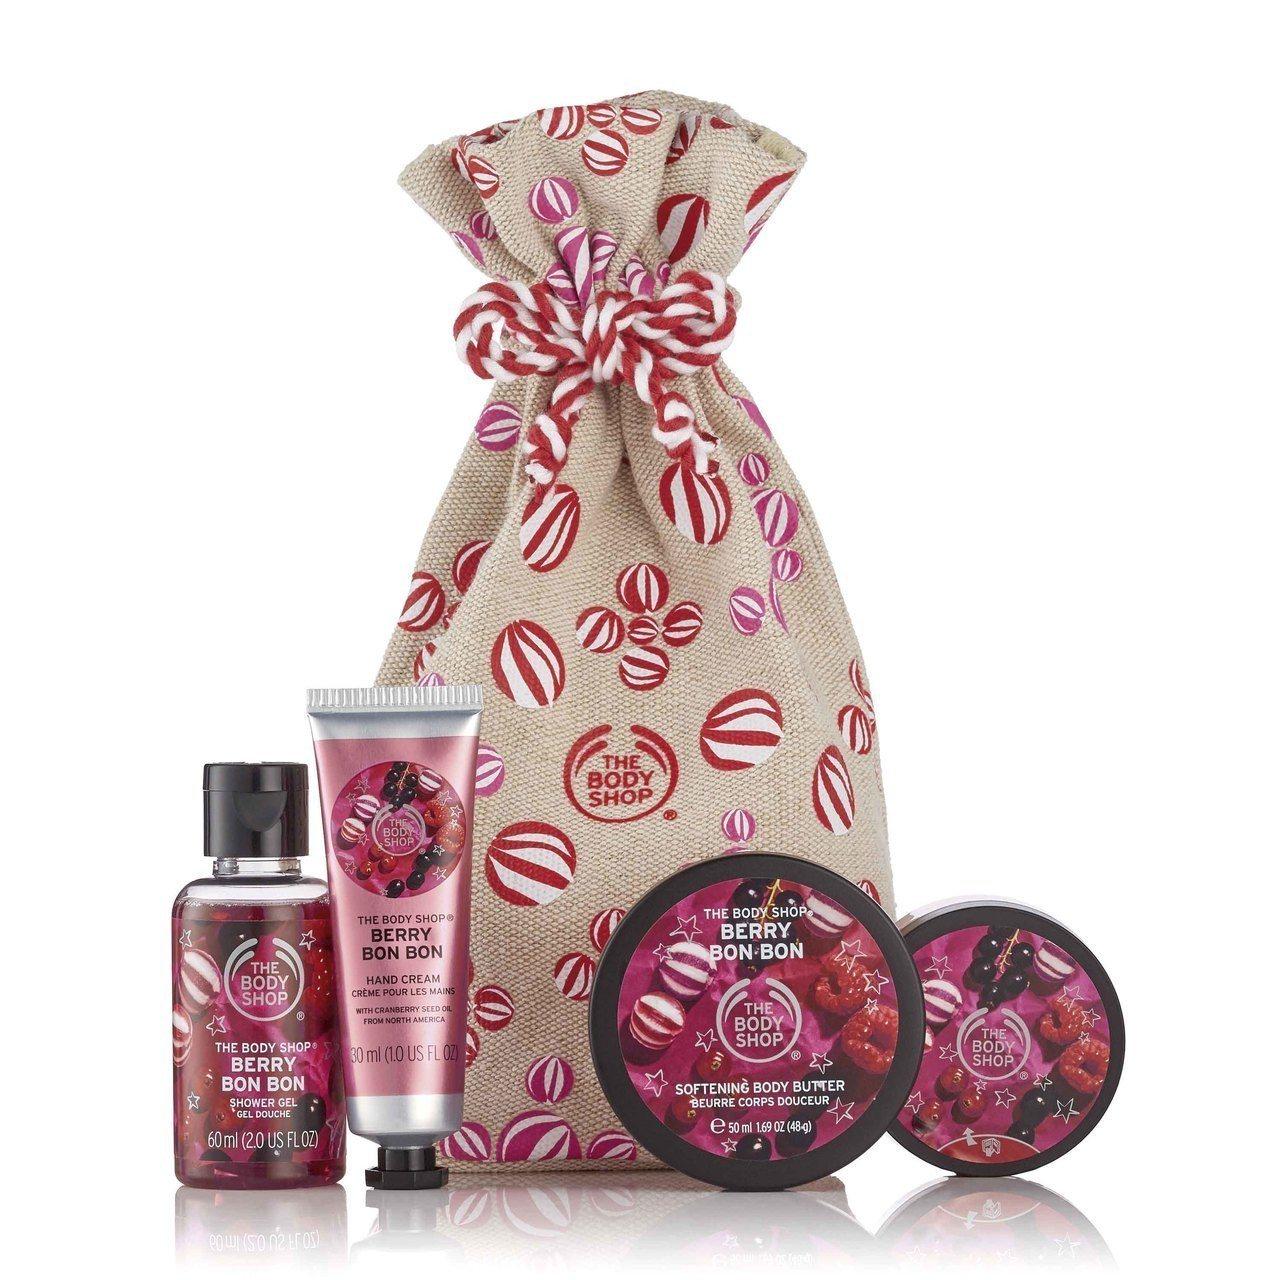 THE BODY SHOP莓果糖果麻袋禮盒,售價1,180元。圖/THE BOD...